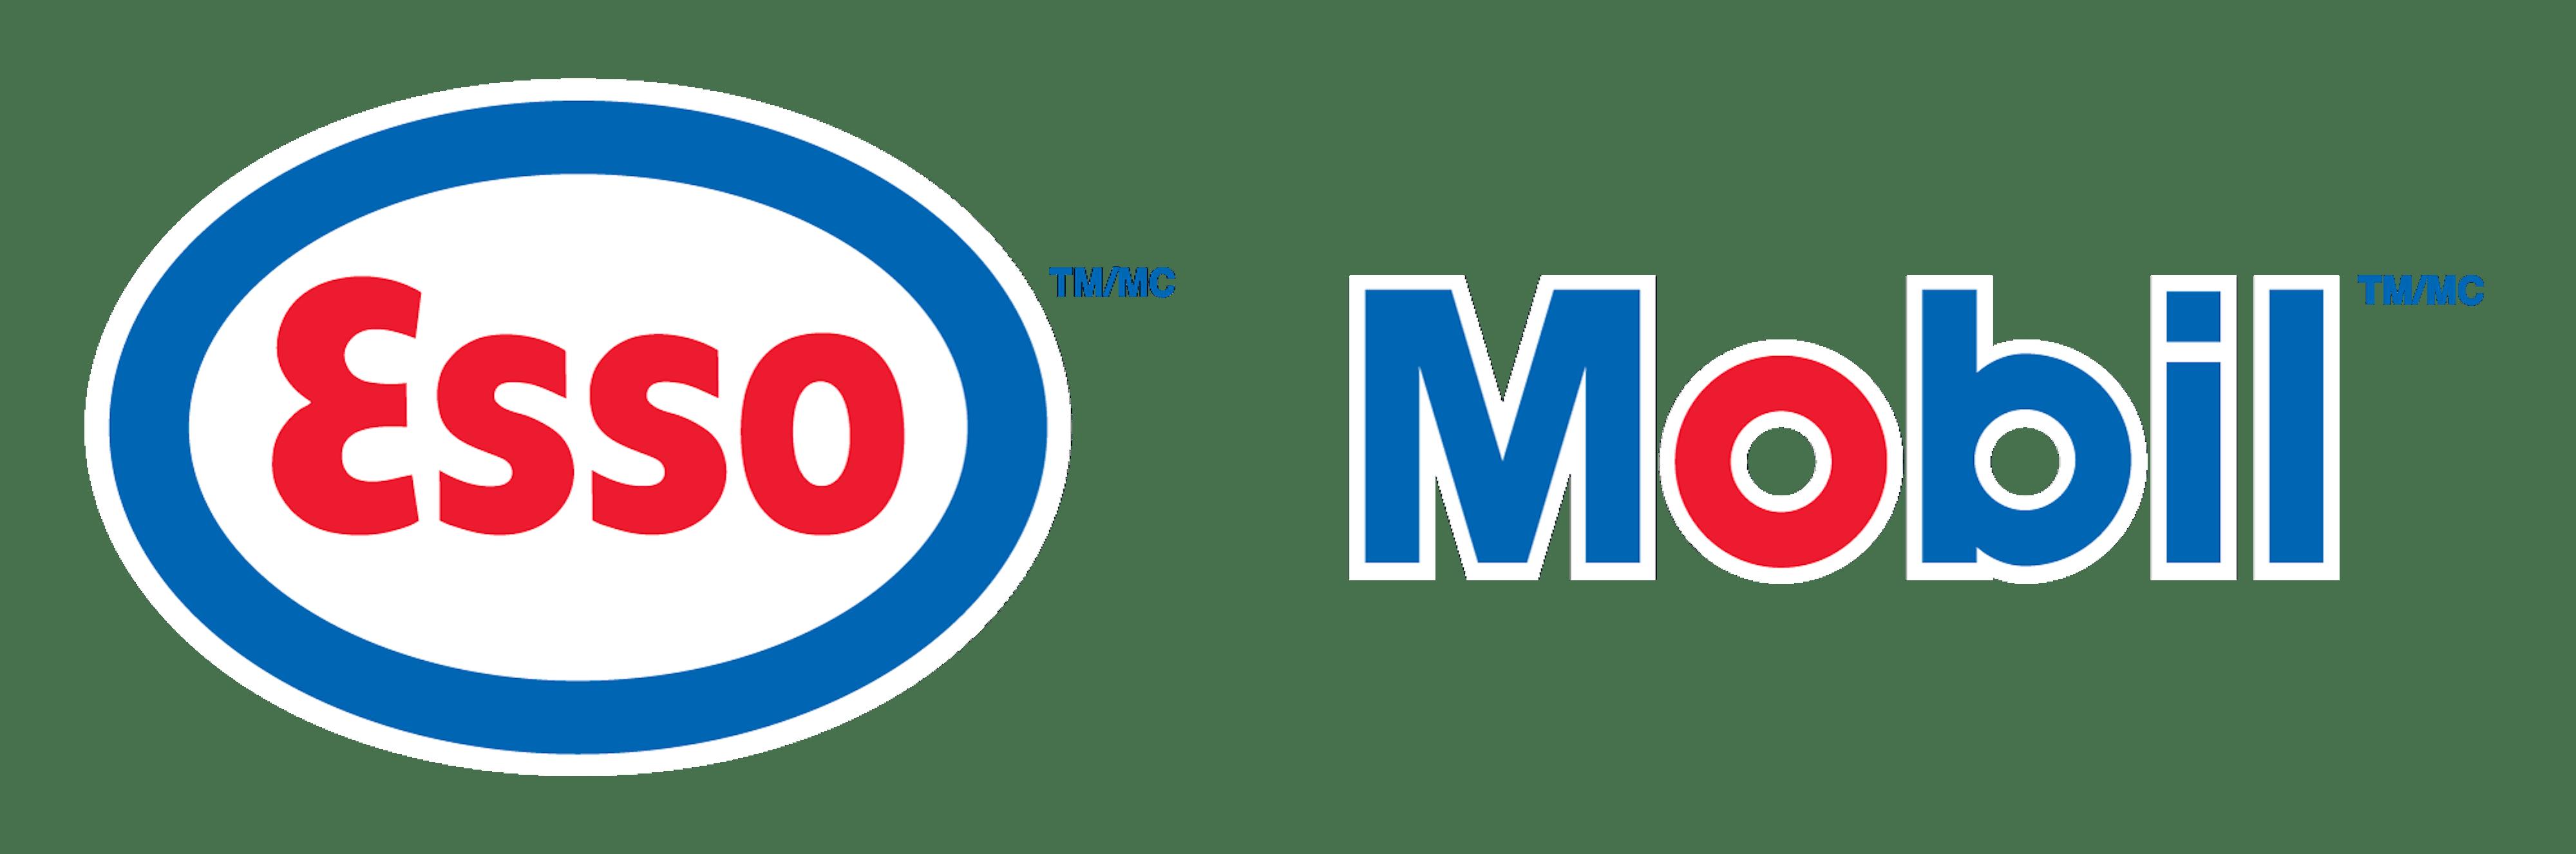 Esso™ and Mobil™ e-Gift Card